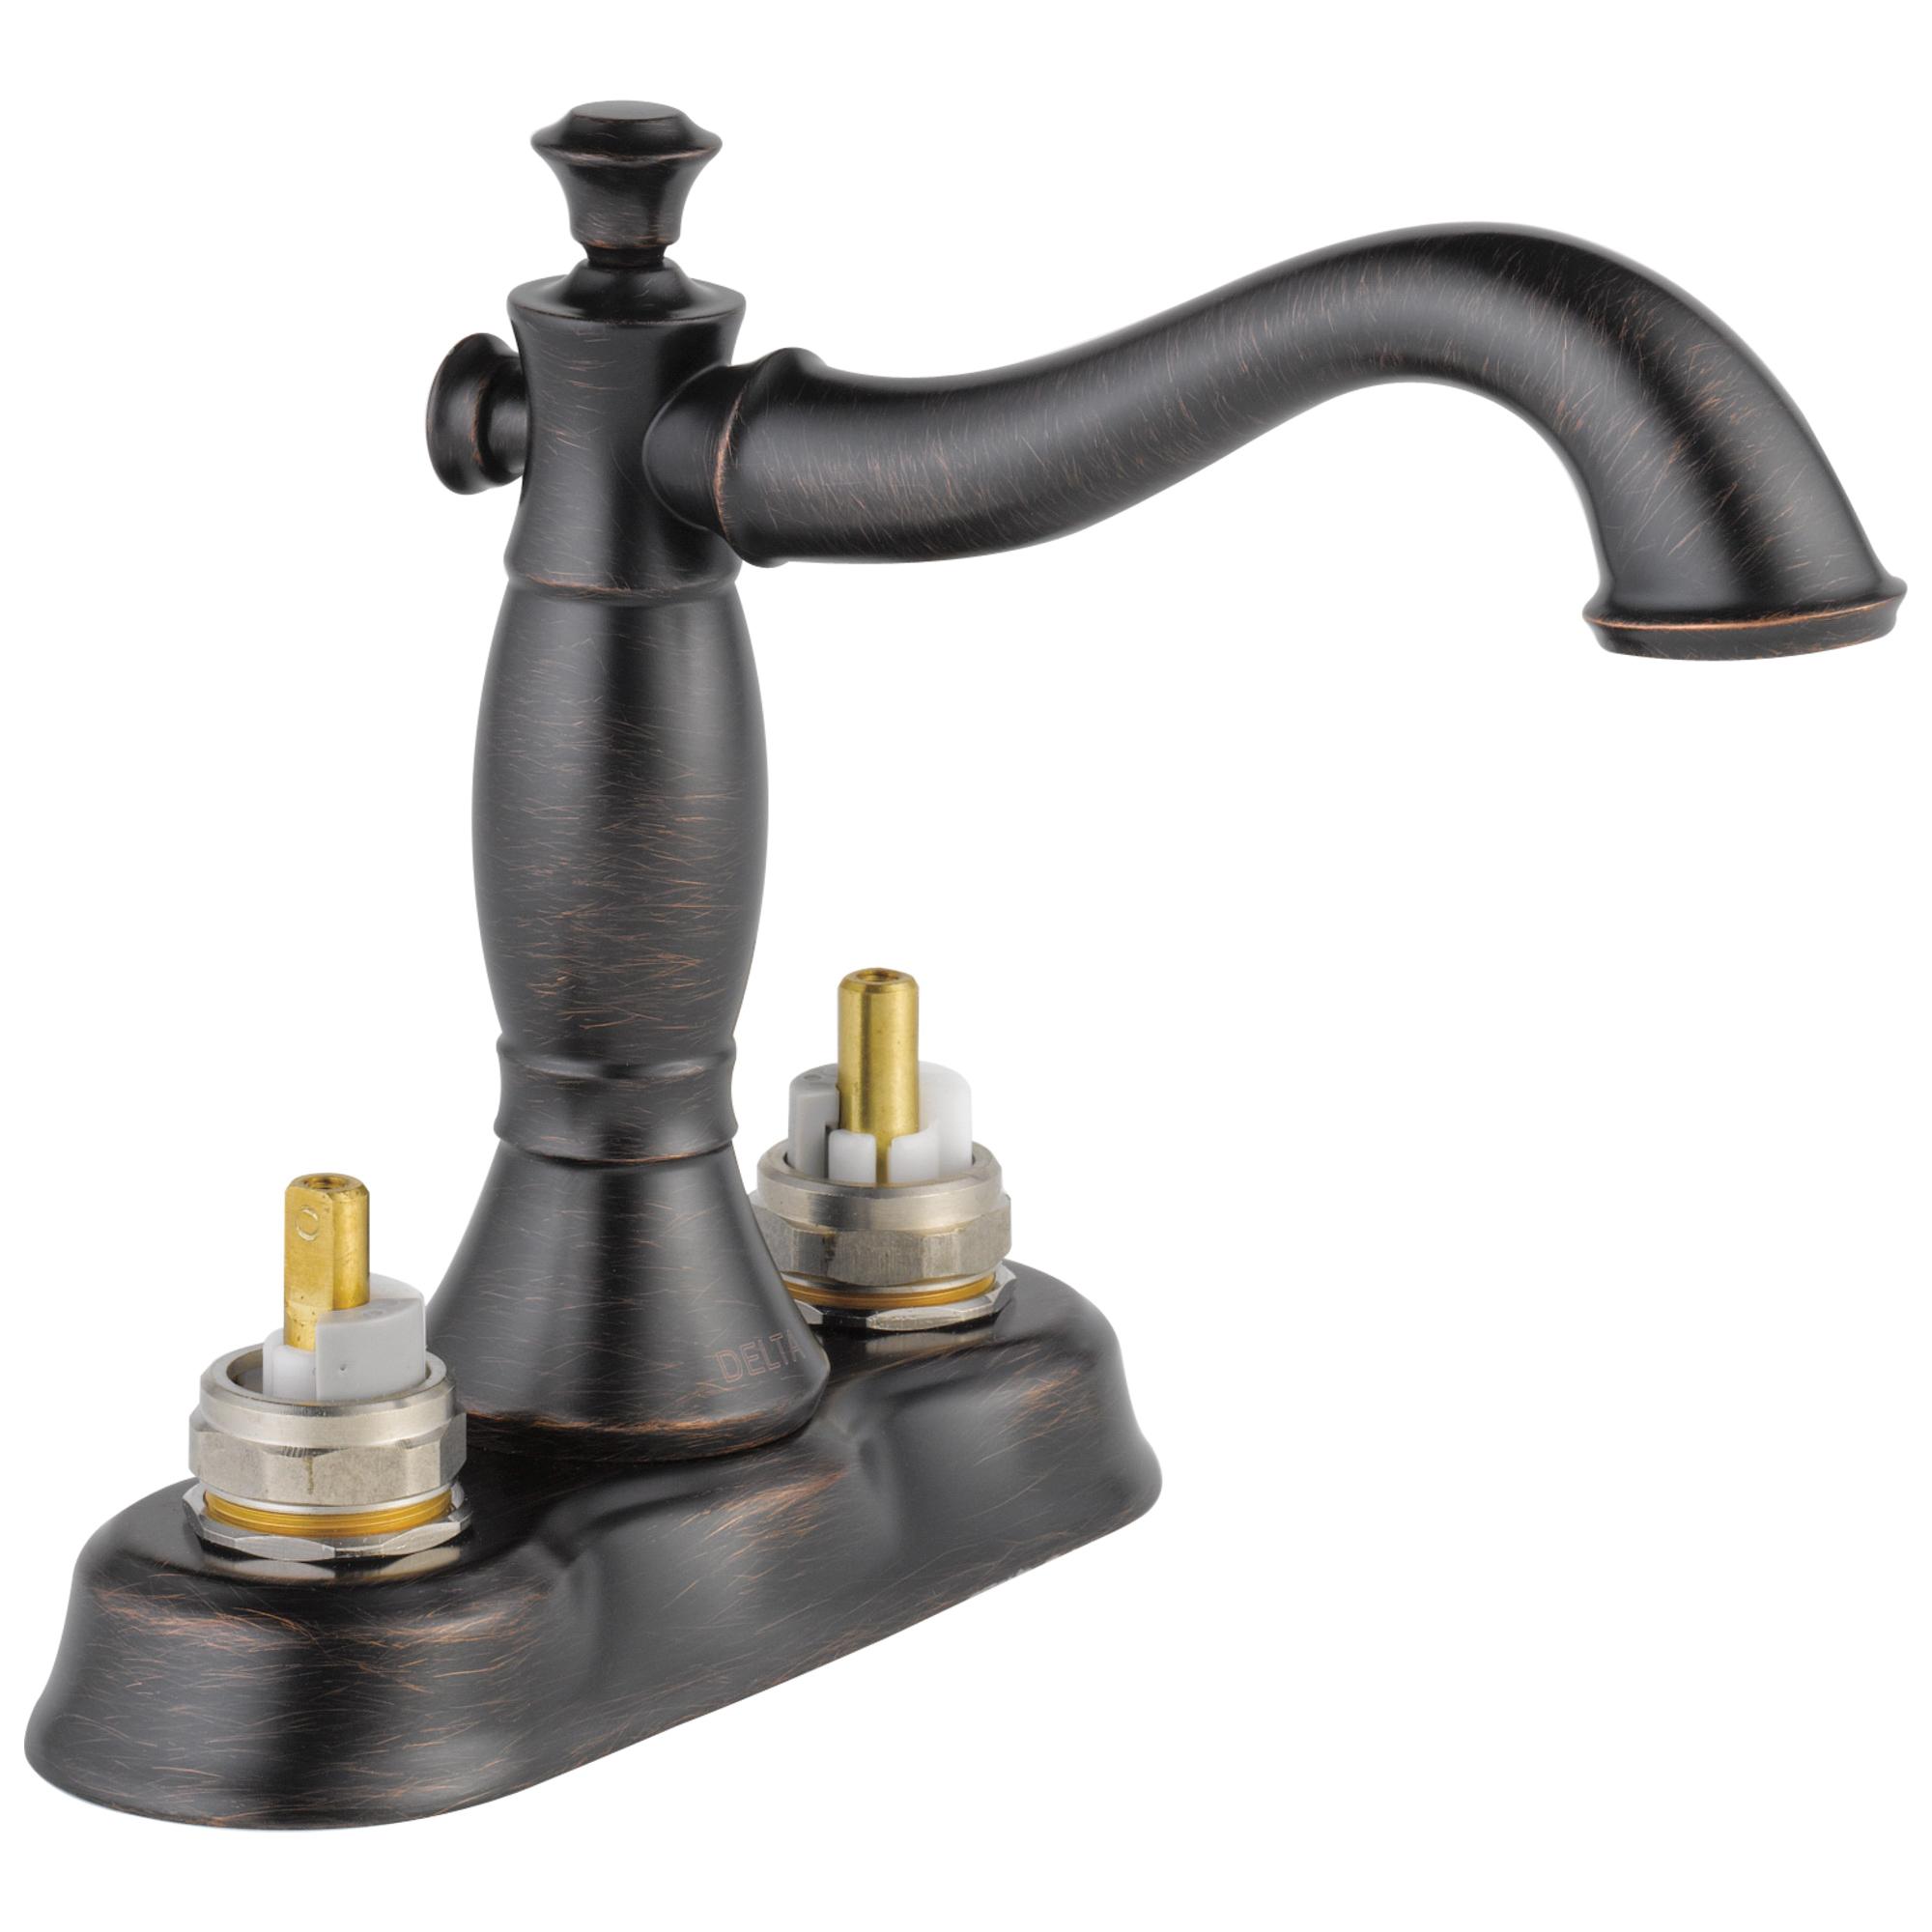 DELTA® 2597LF-RBMPU-LHP Centerset Lavatory Faucet, Cassidy™, Venetian Bronze, Pop-Up Drain, 1.2 gpm